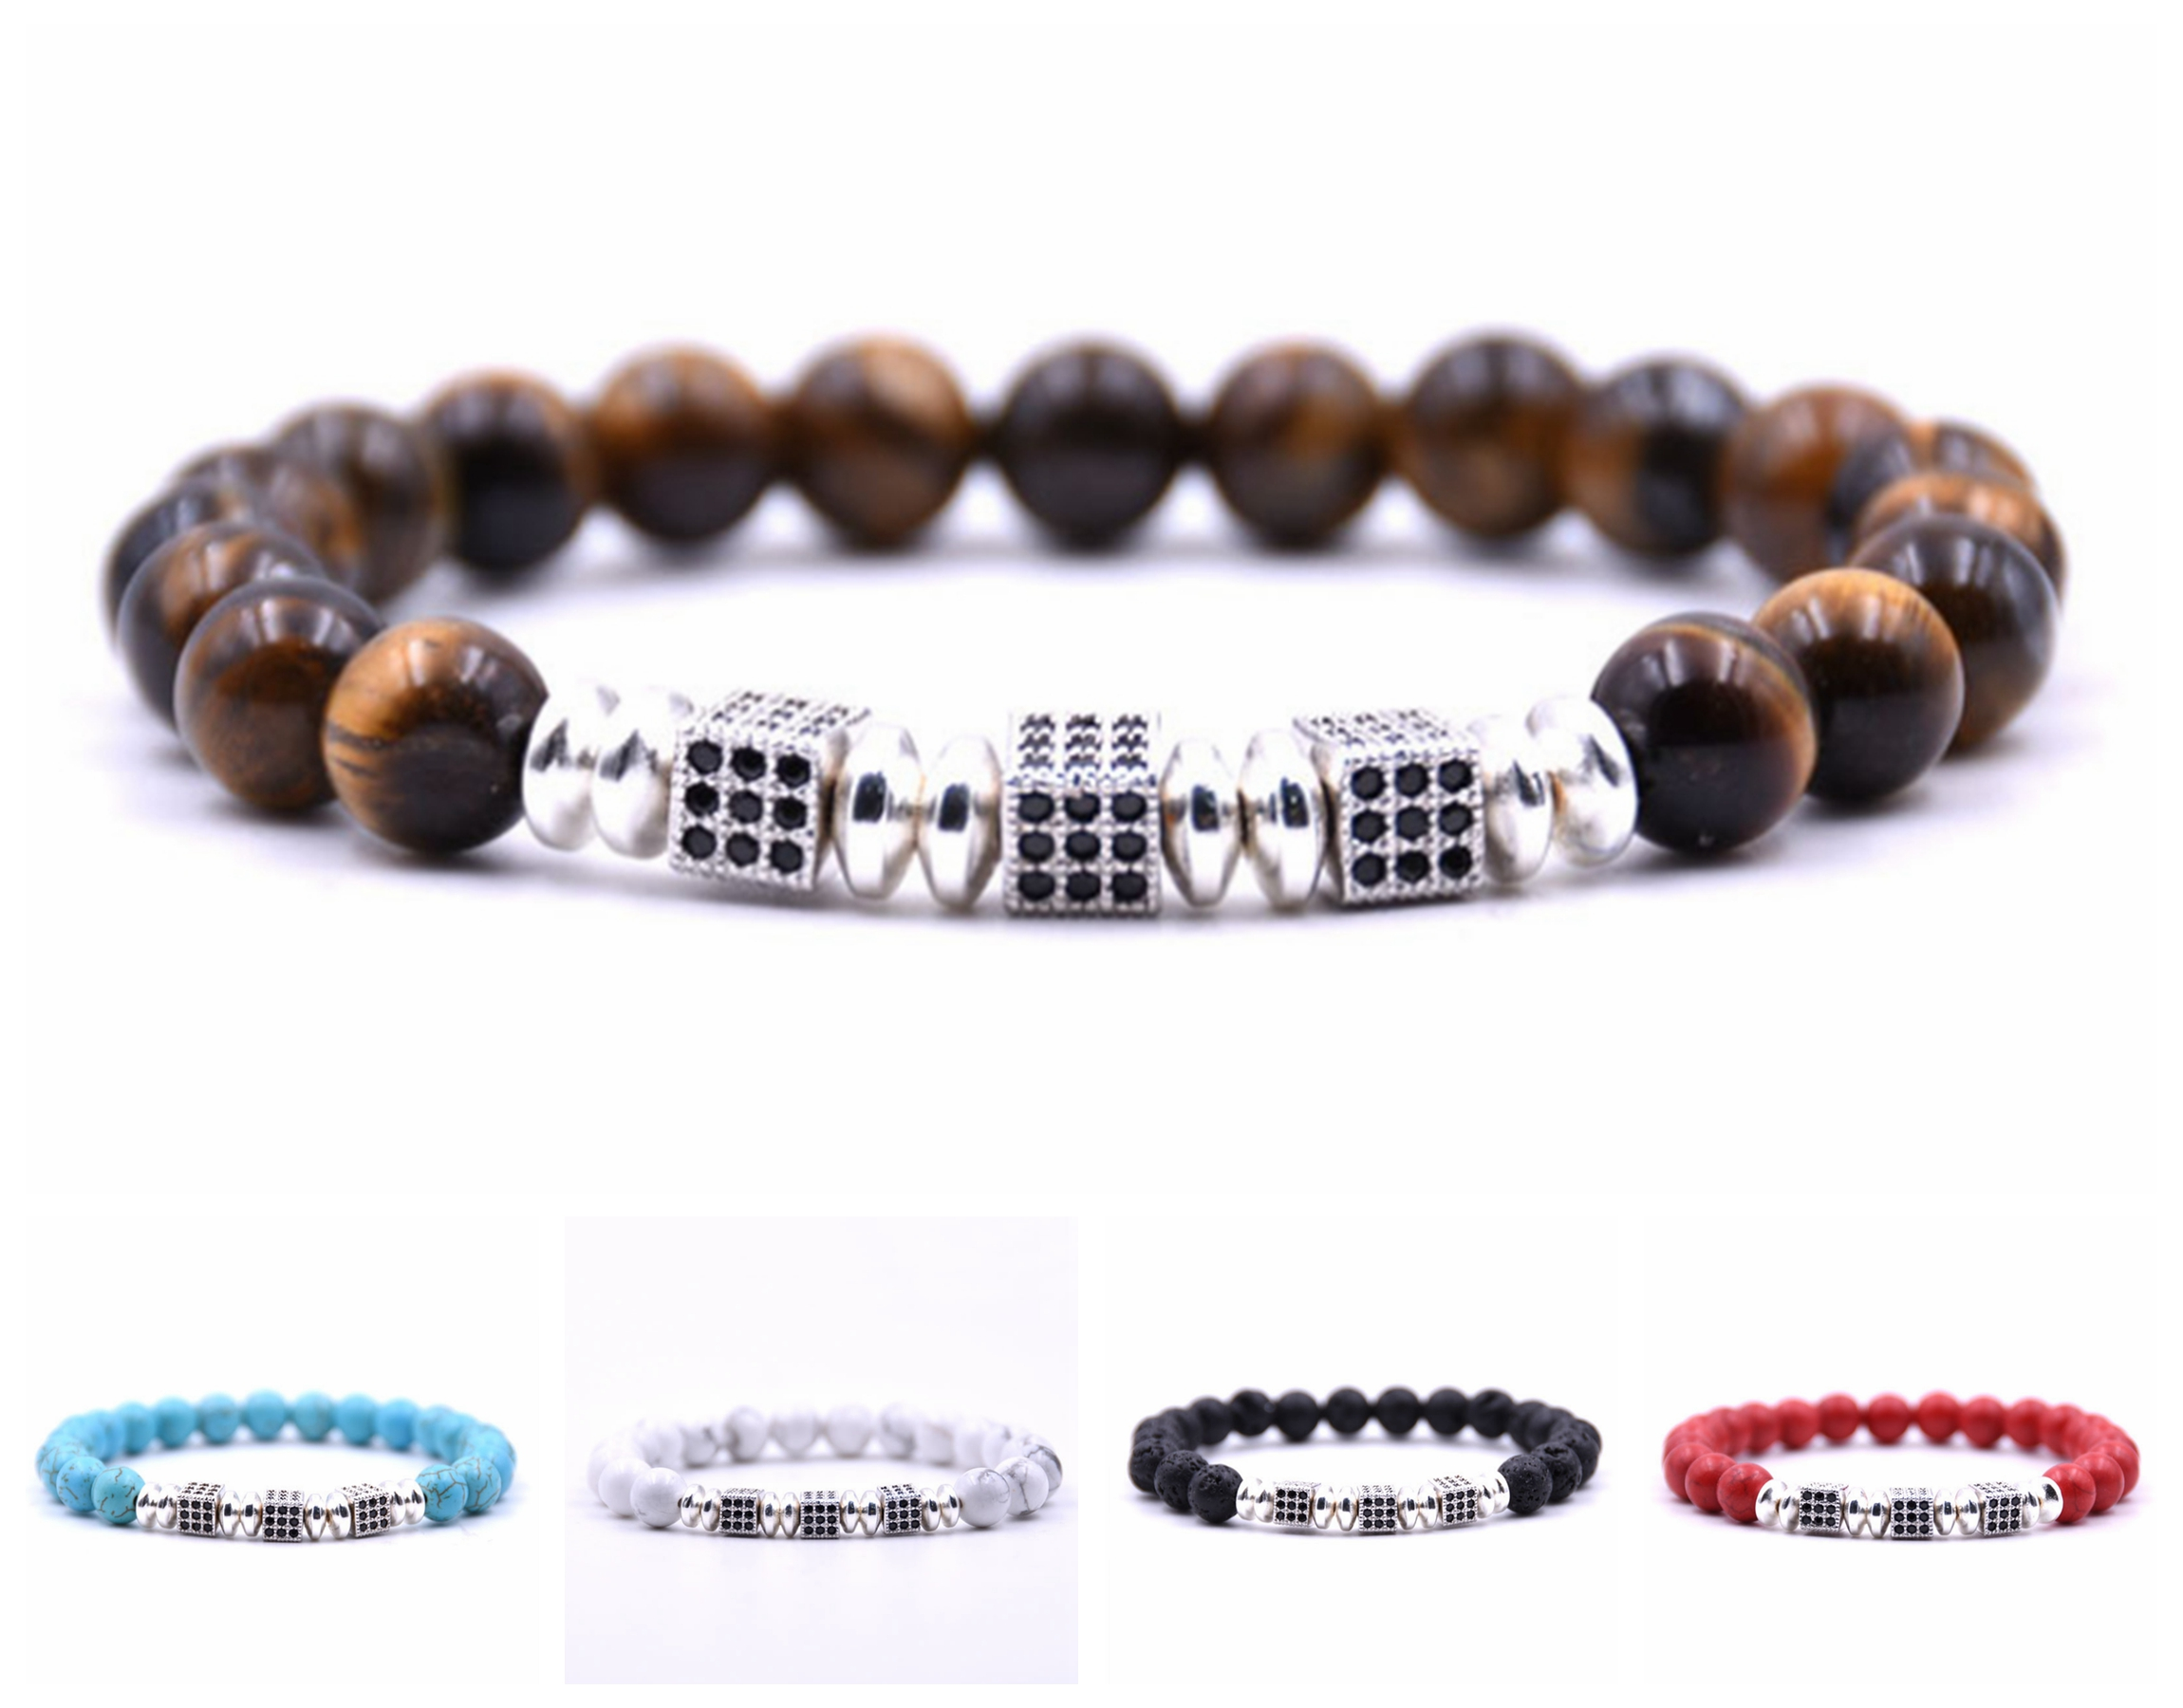 8mm Natural Healing Stone Bracelets